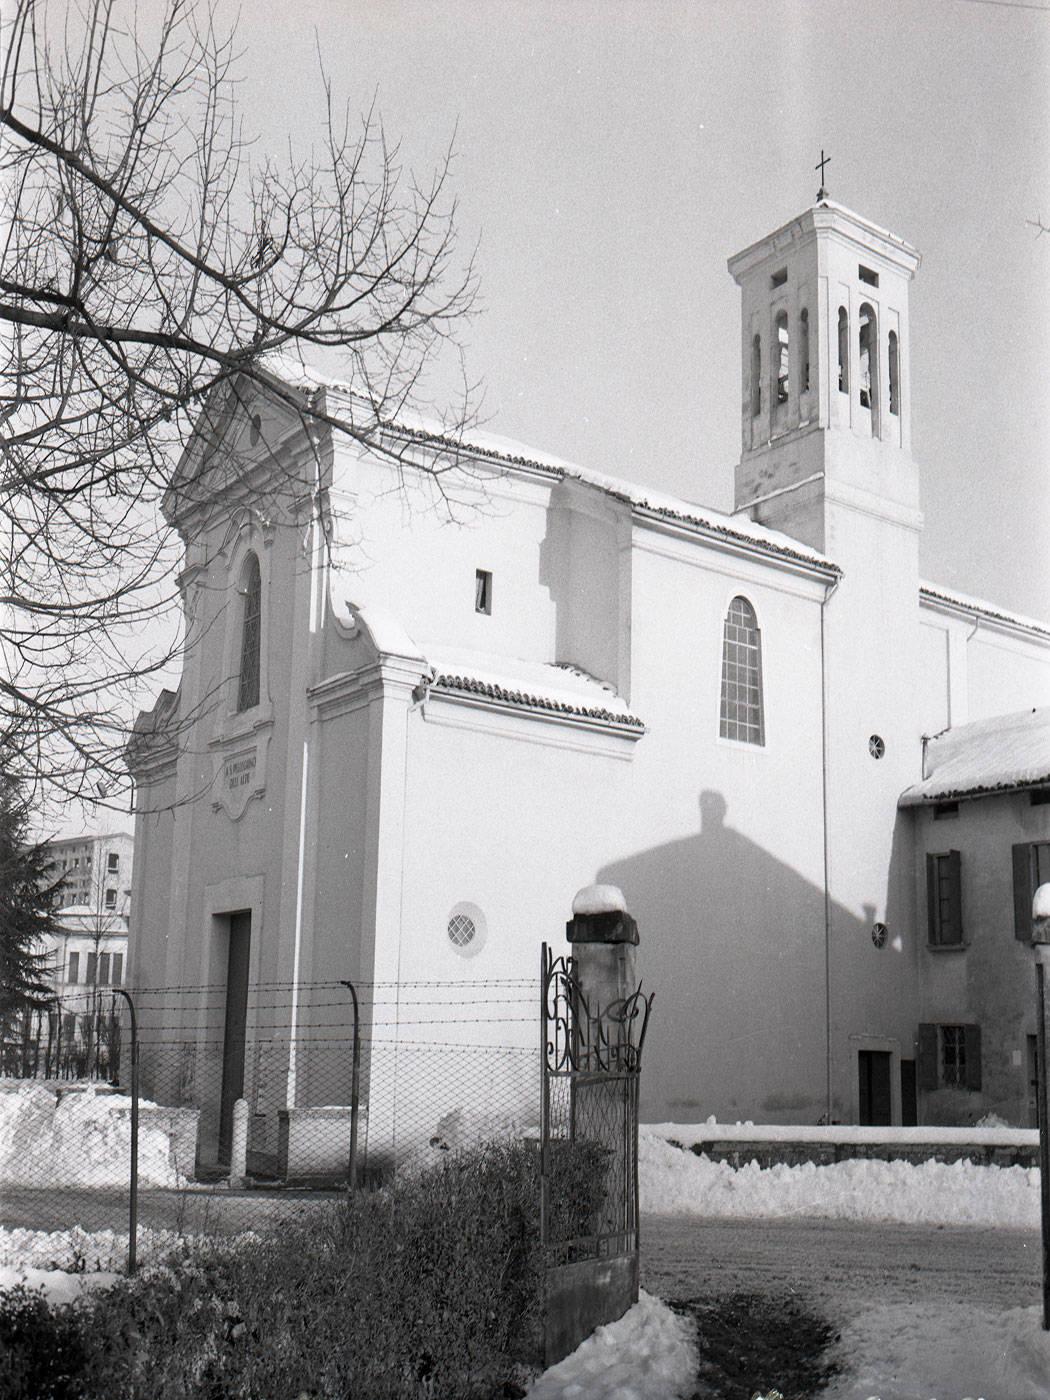 CHIESA DI SAN PELLEGRINO FOTOTECA BIBLIOTECA PANIZZI, STUDIO VAIANI, REGGIO EMILIA 1960